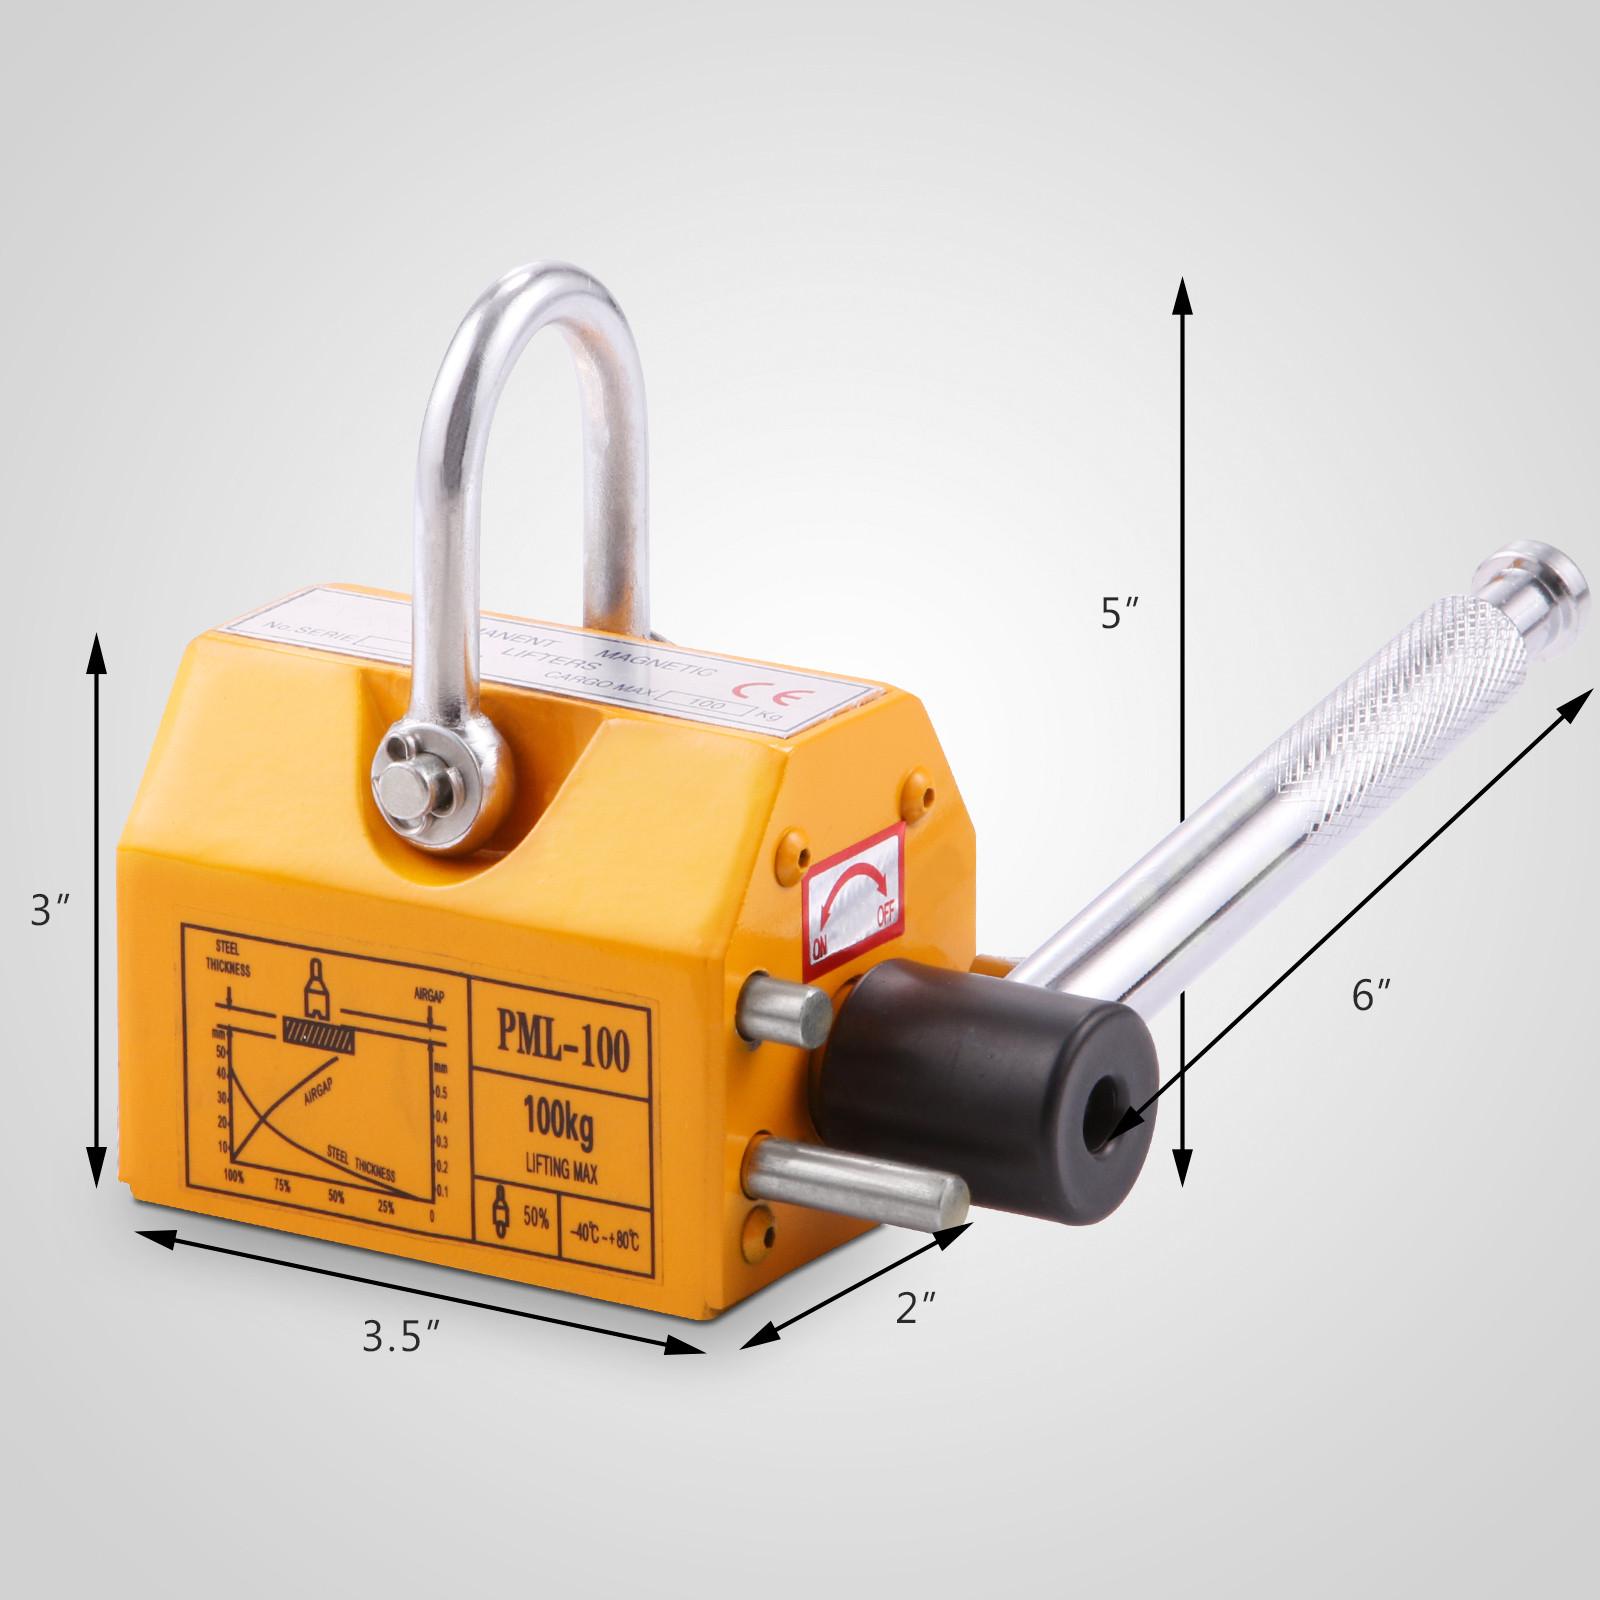 100-300-600-1000KG-Steel-Magnetic-Lifter-Heavy-Duty-Crane-Hoist-Lifting-Magnet miniature 14